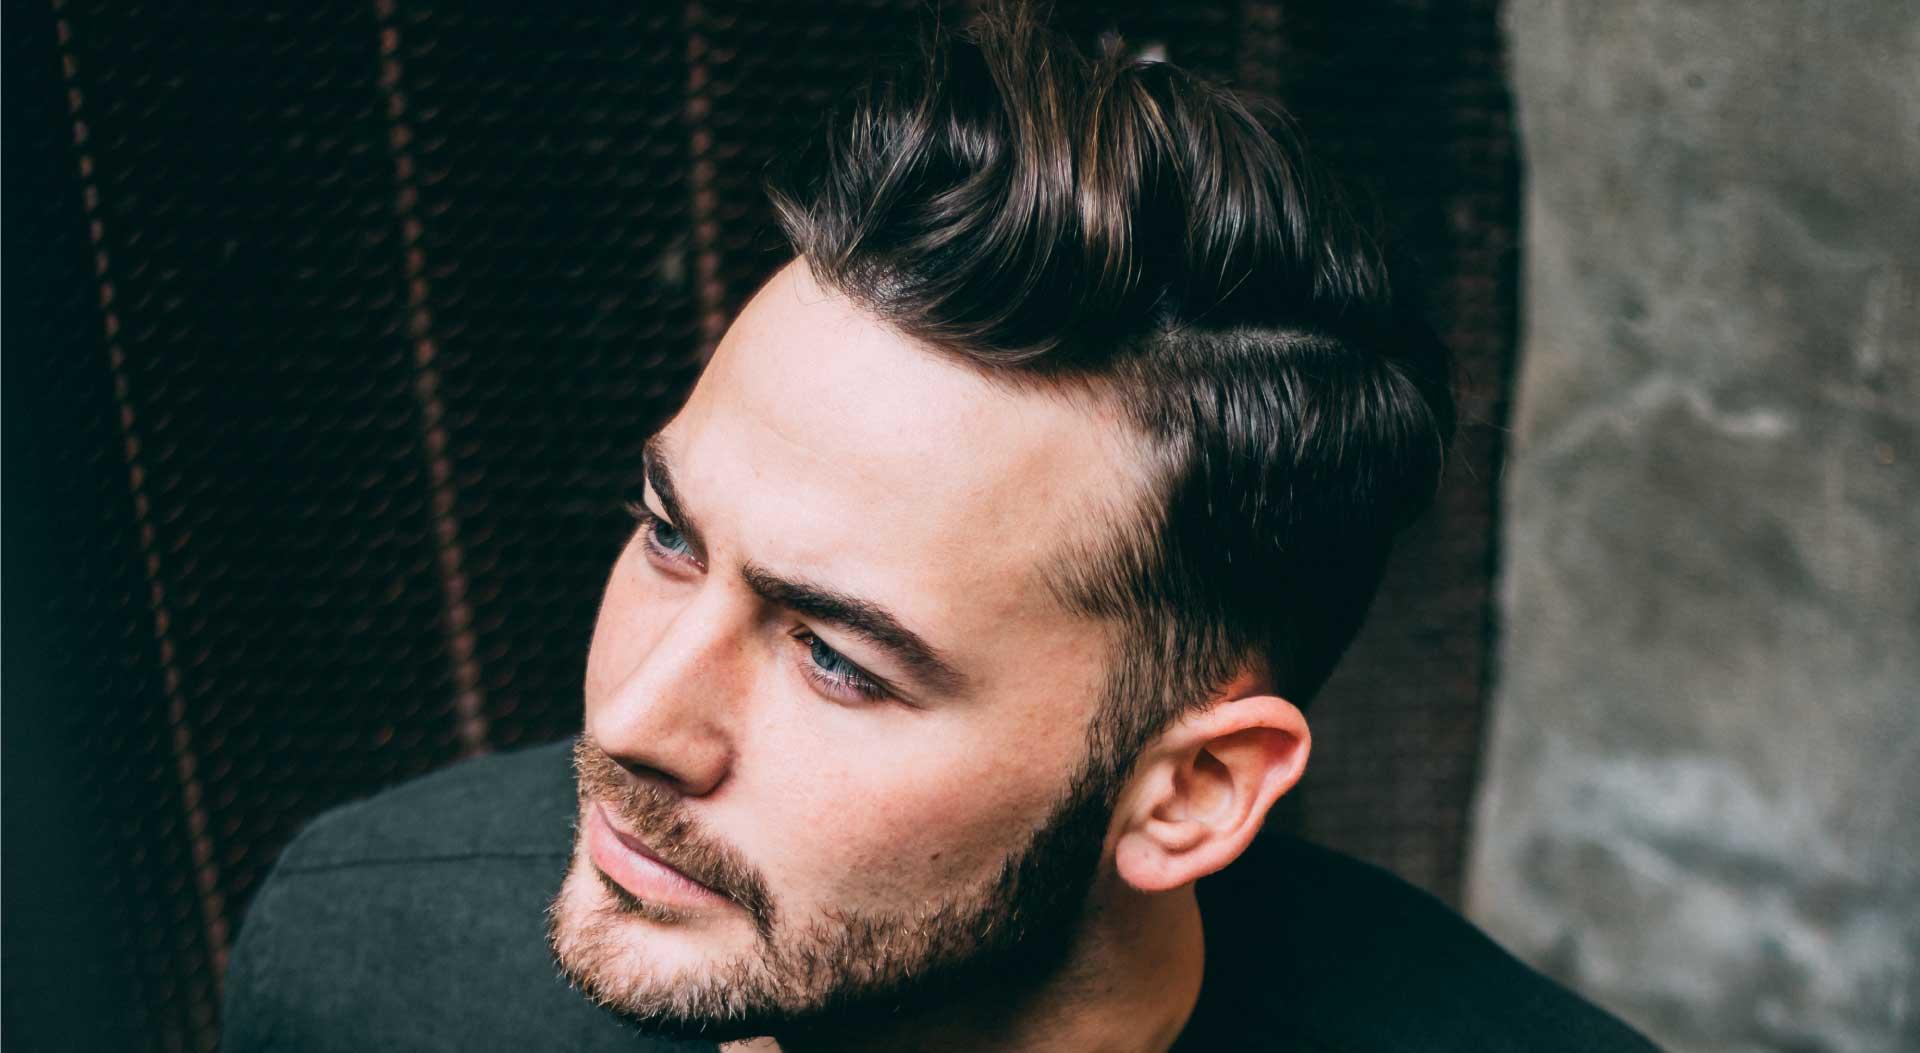 protesi capelli ferrara uomo su misura toupet impianto capillare maschile membrana patch cutanea